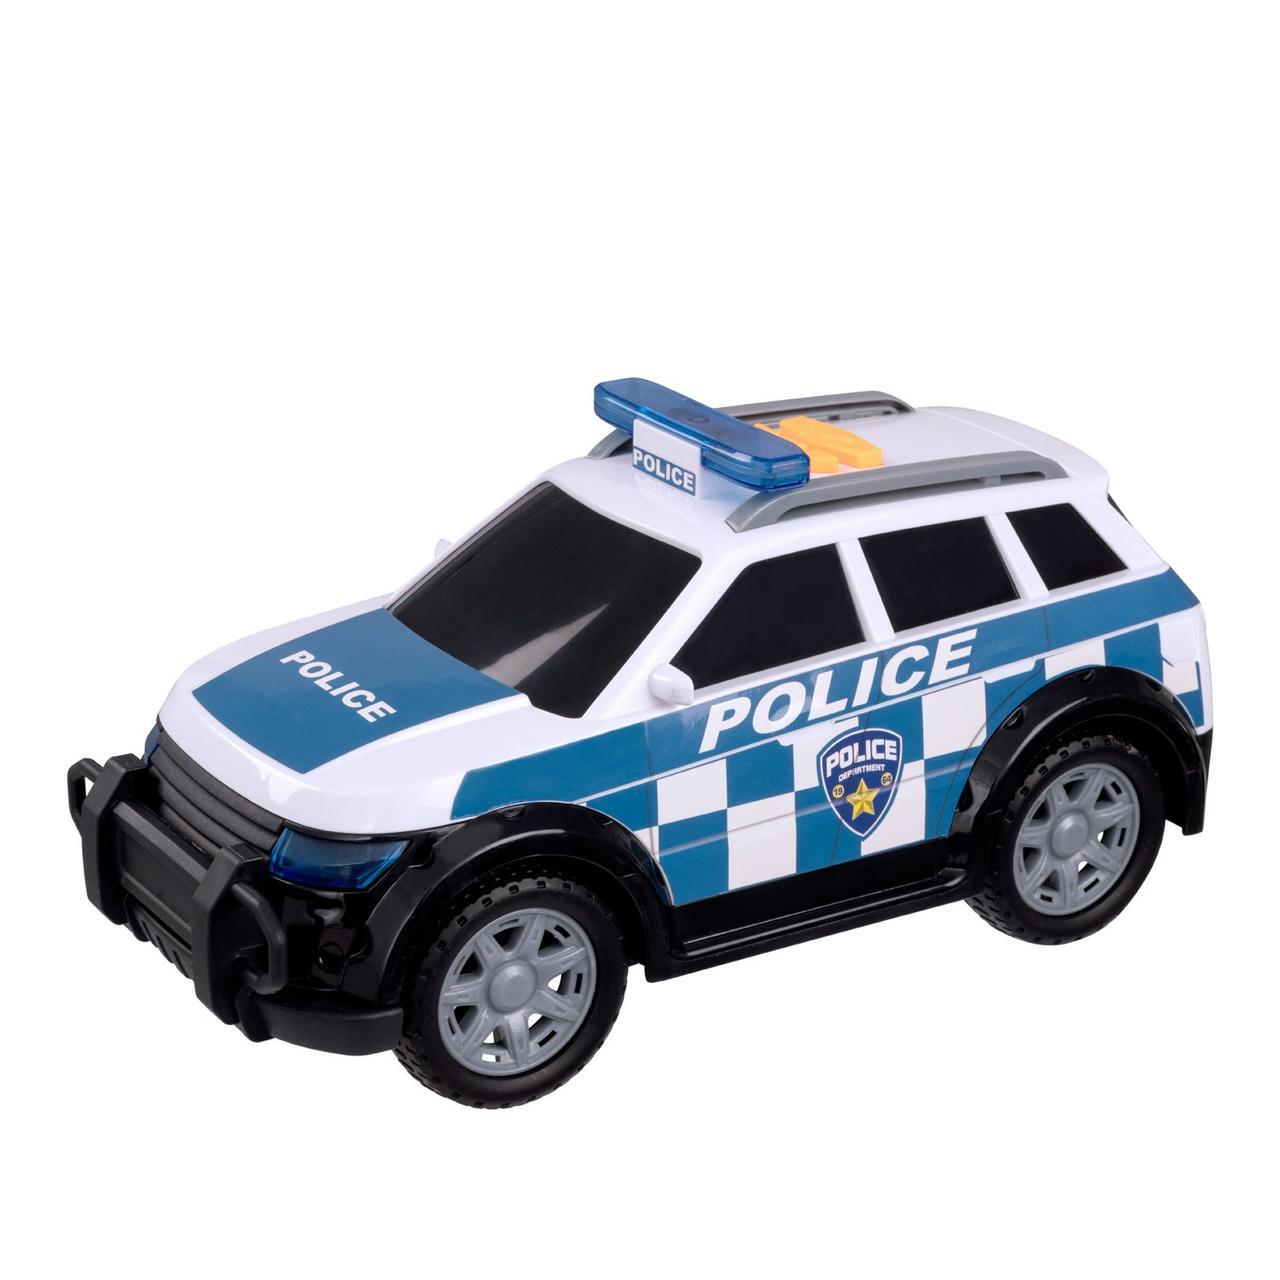 Teamsterz Игрушечная машинка Mighty Moverz Полиция 4x4 25 см (свет, звук)